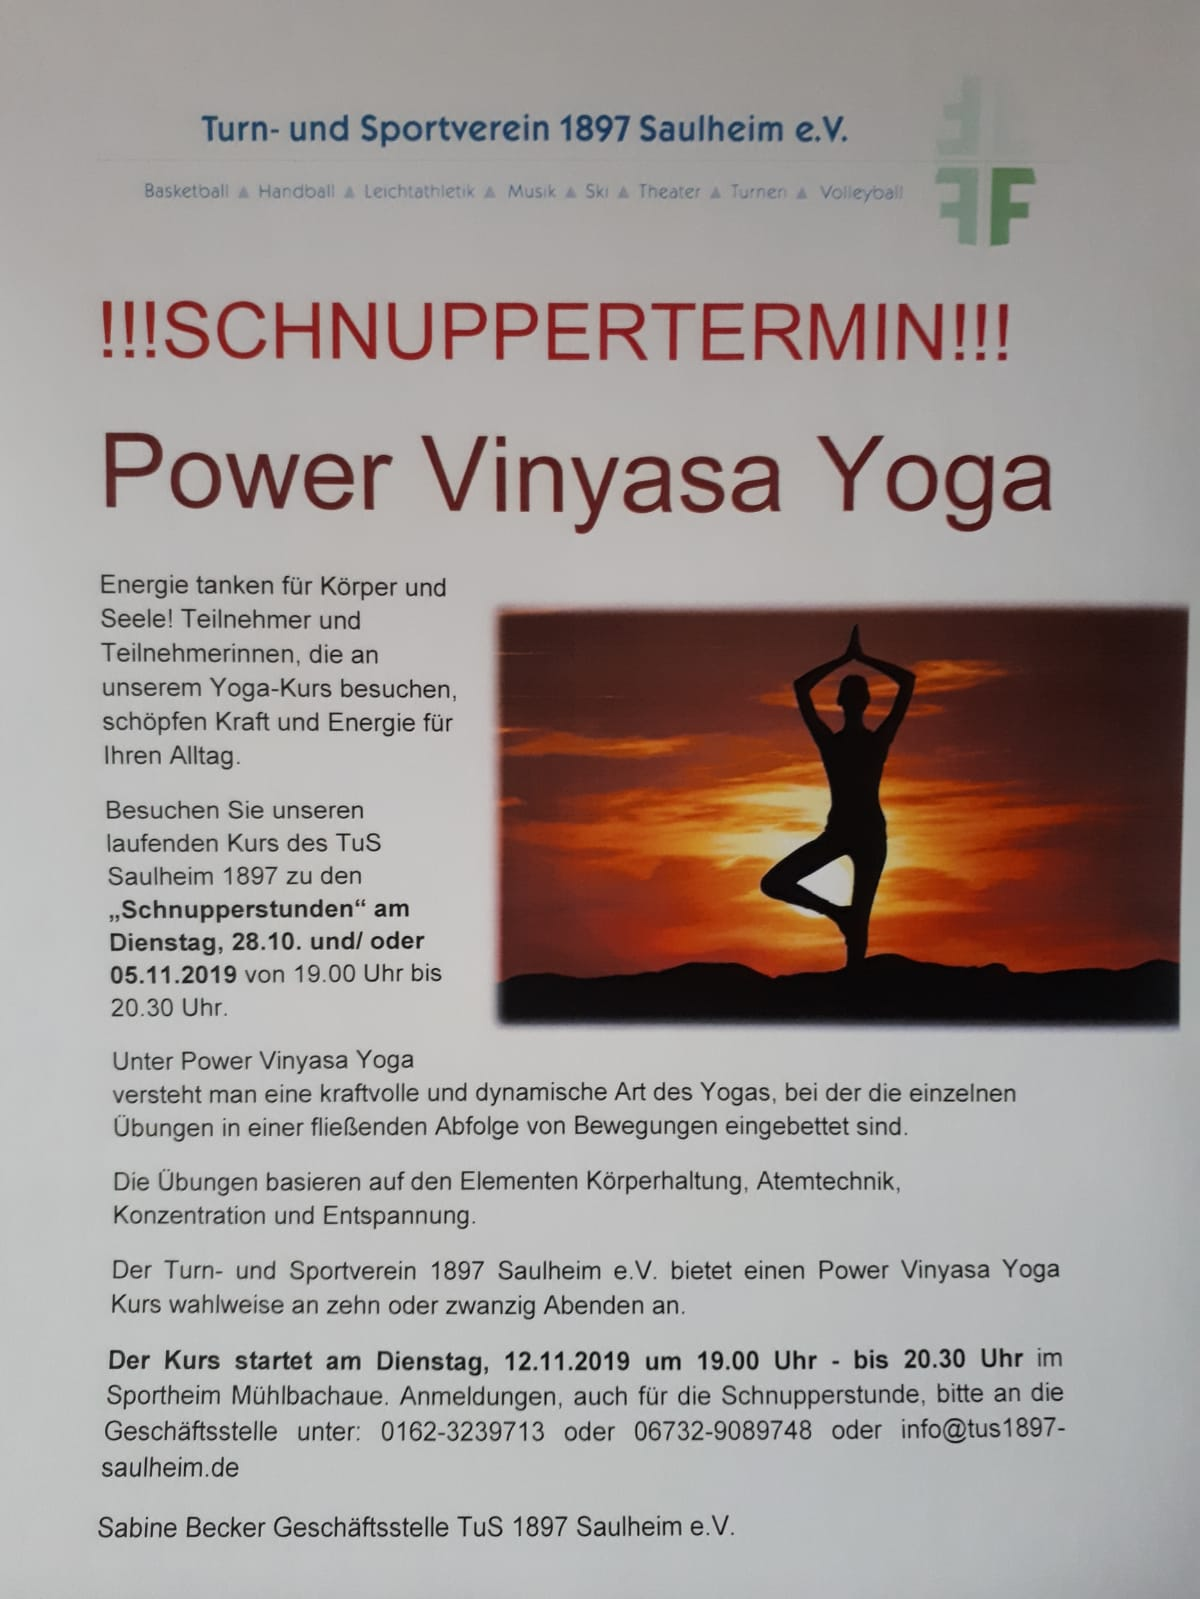 Schnuppertermin - Power Vinyasa Yoga @ Sportheim Mühlbachaue